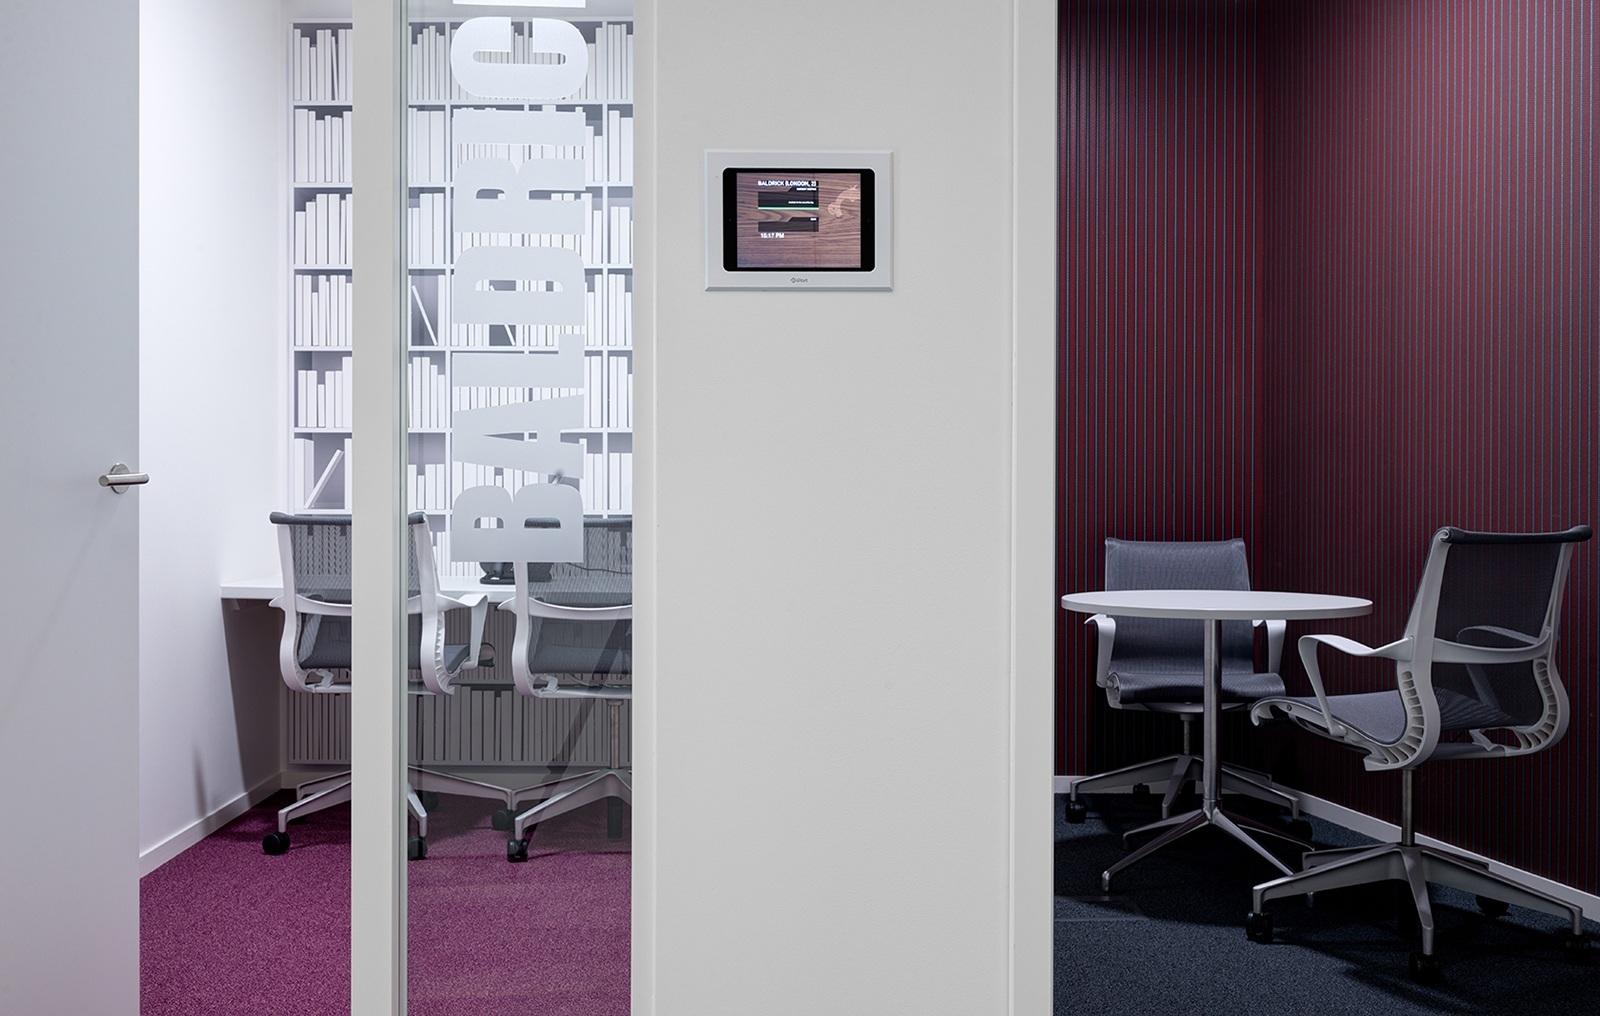 survey-monkey-london-office-5